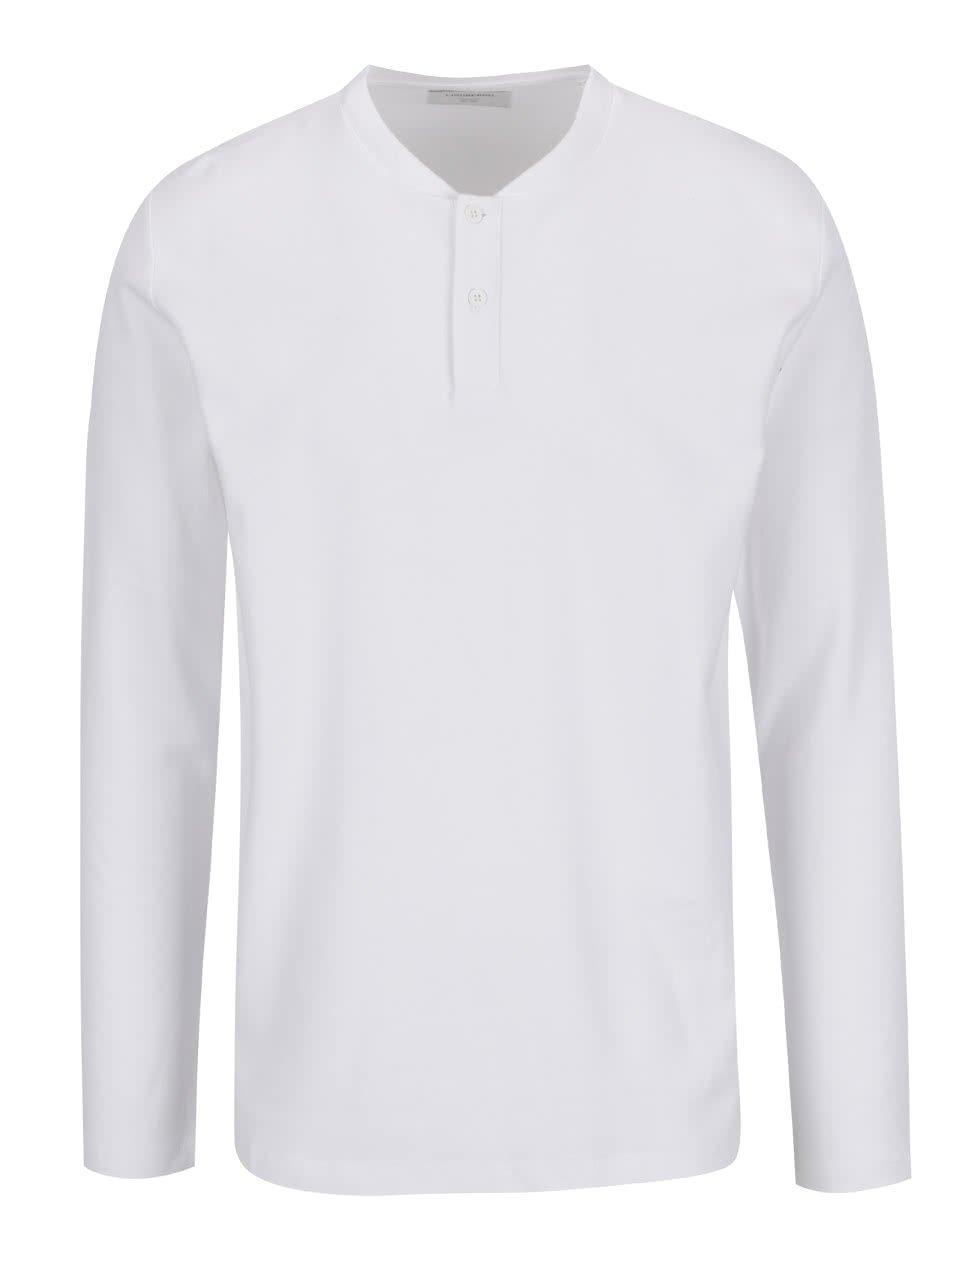 Bílé triko s dlouhým rukávem Lindbergh